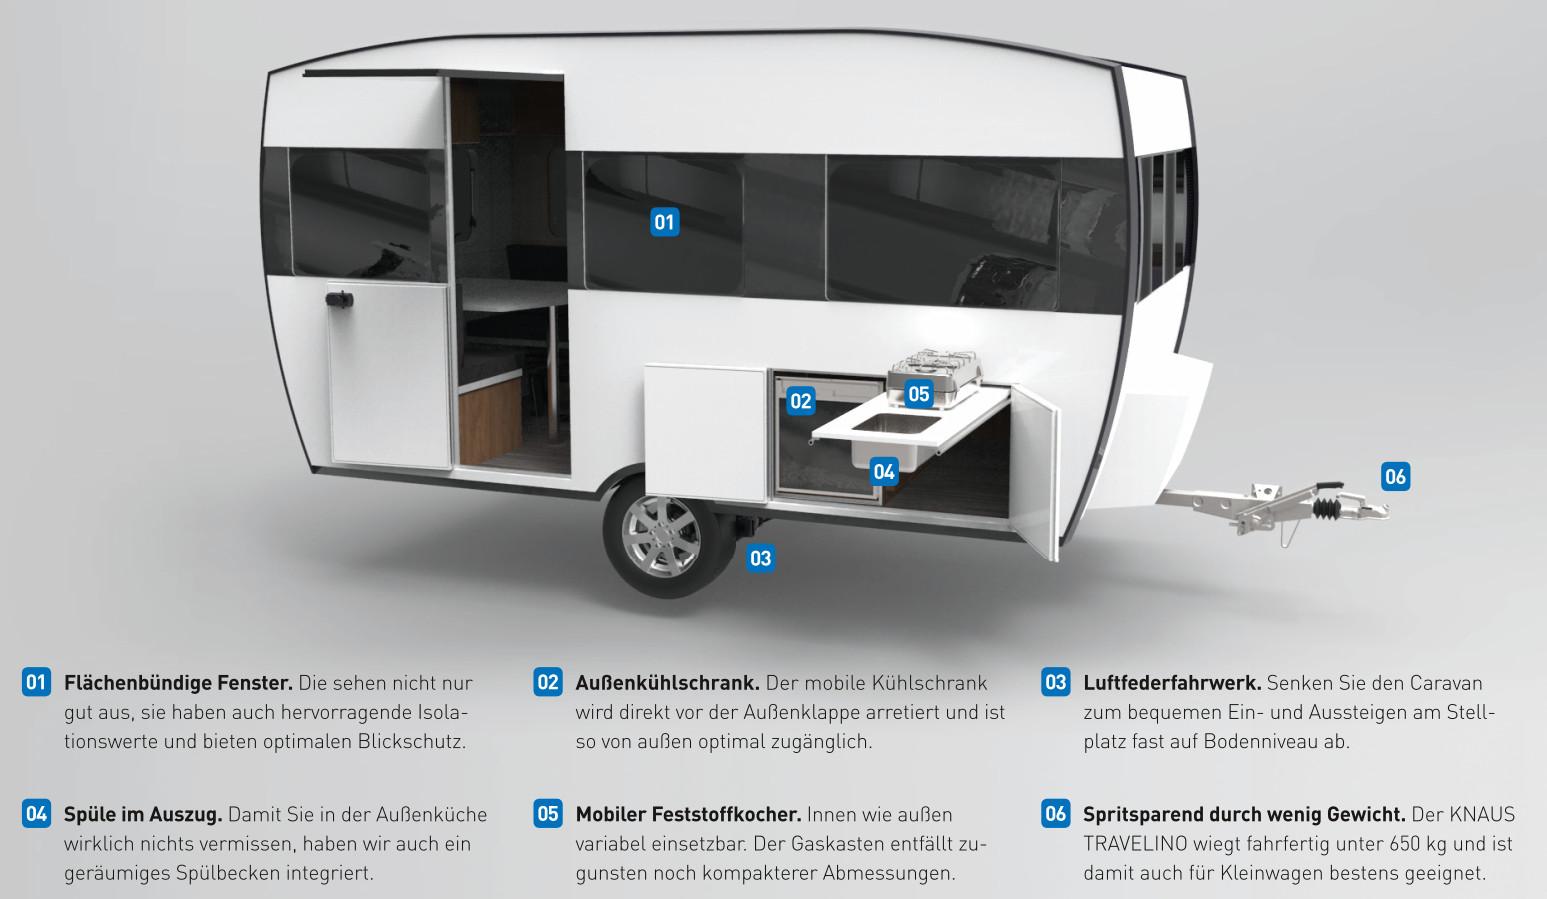 Knaus Travelino Caravan-Studie. © spothits/Knaus